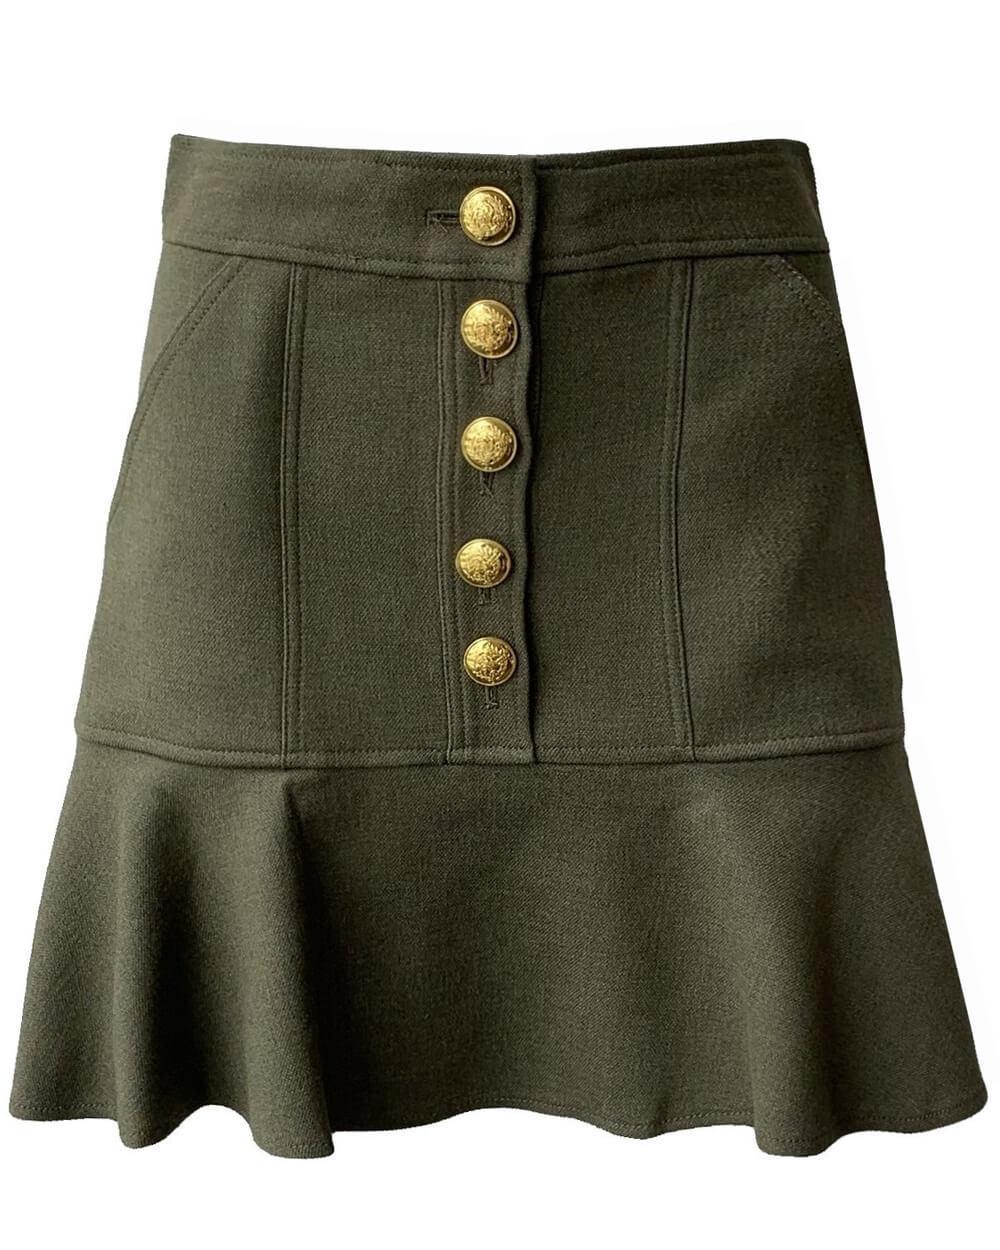 Marnell Skirt